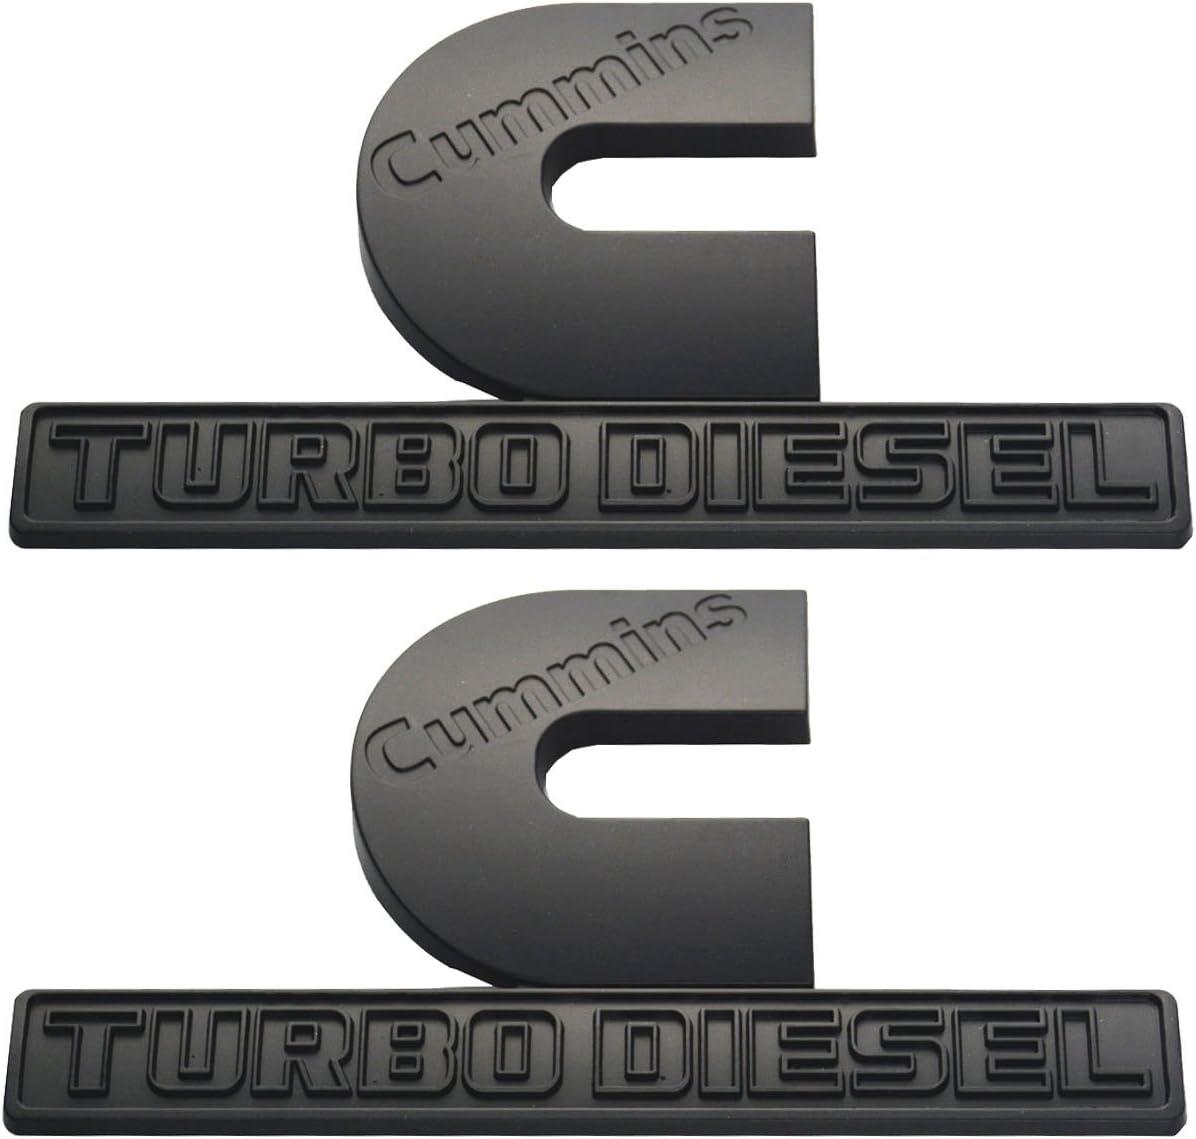 Chrome Aimoll 2pcs Cummins Turbo Diesel emblems,3D Decal Badges High Output for Ram 2500 3500 Nameplate Emblem Mopar